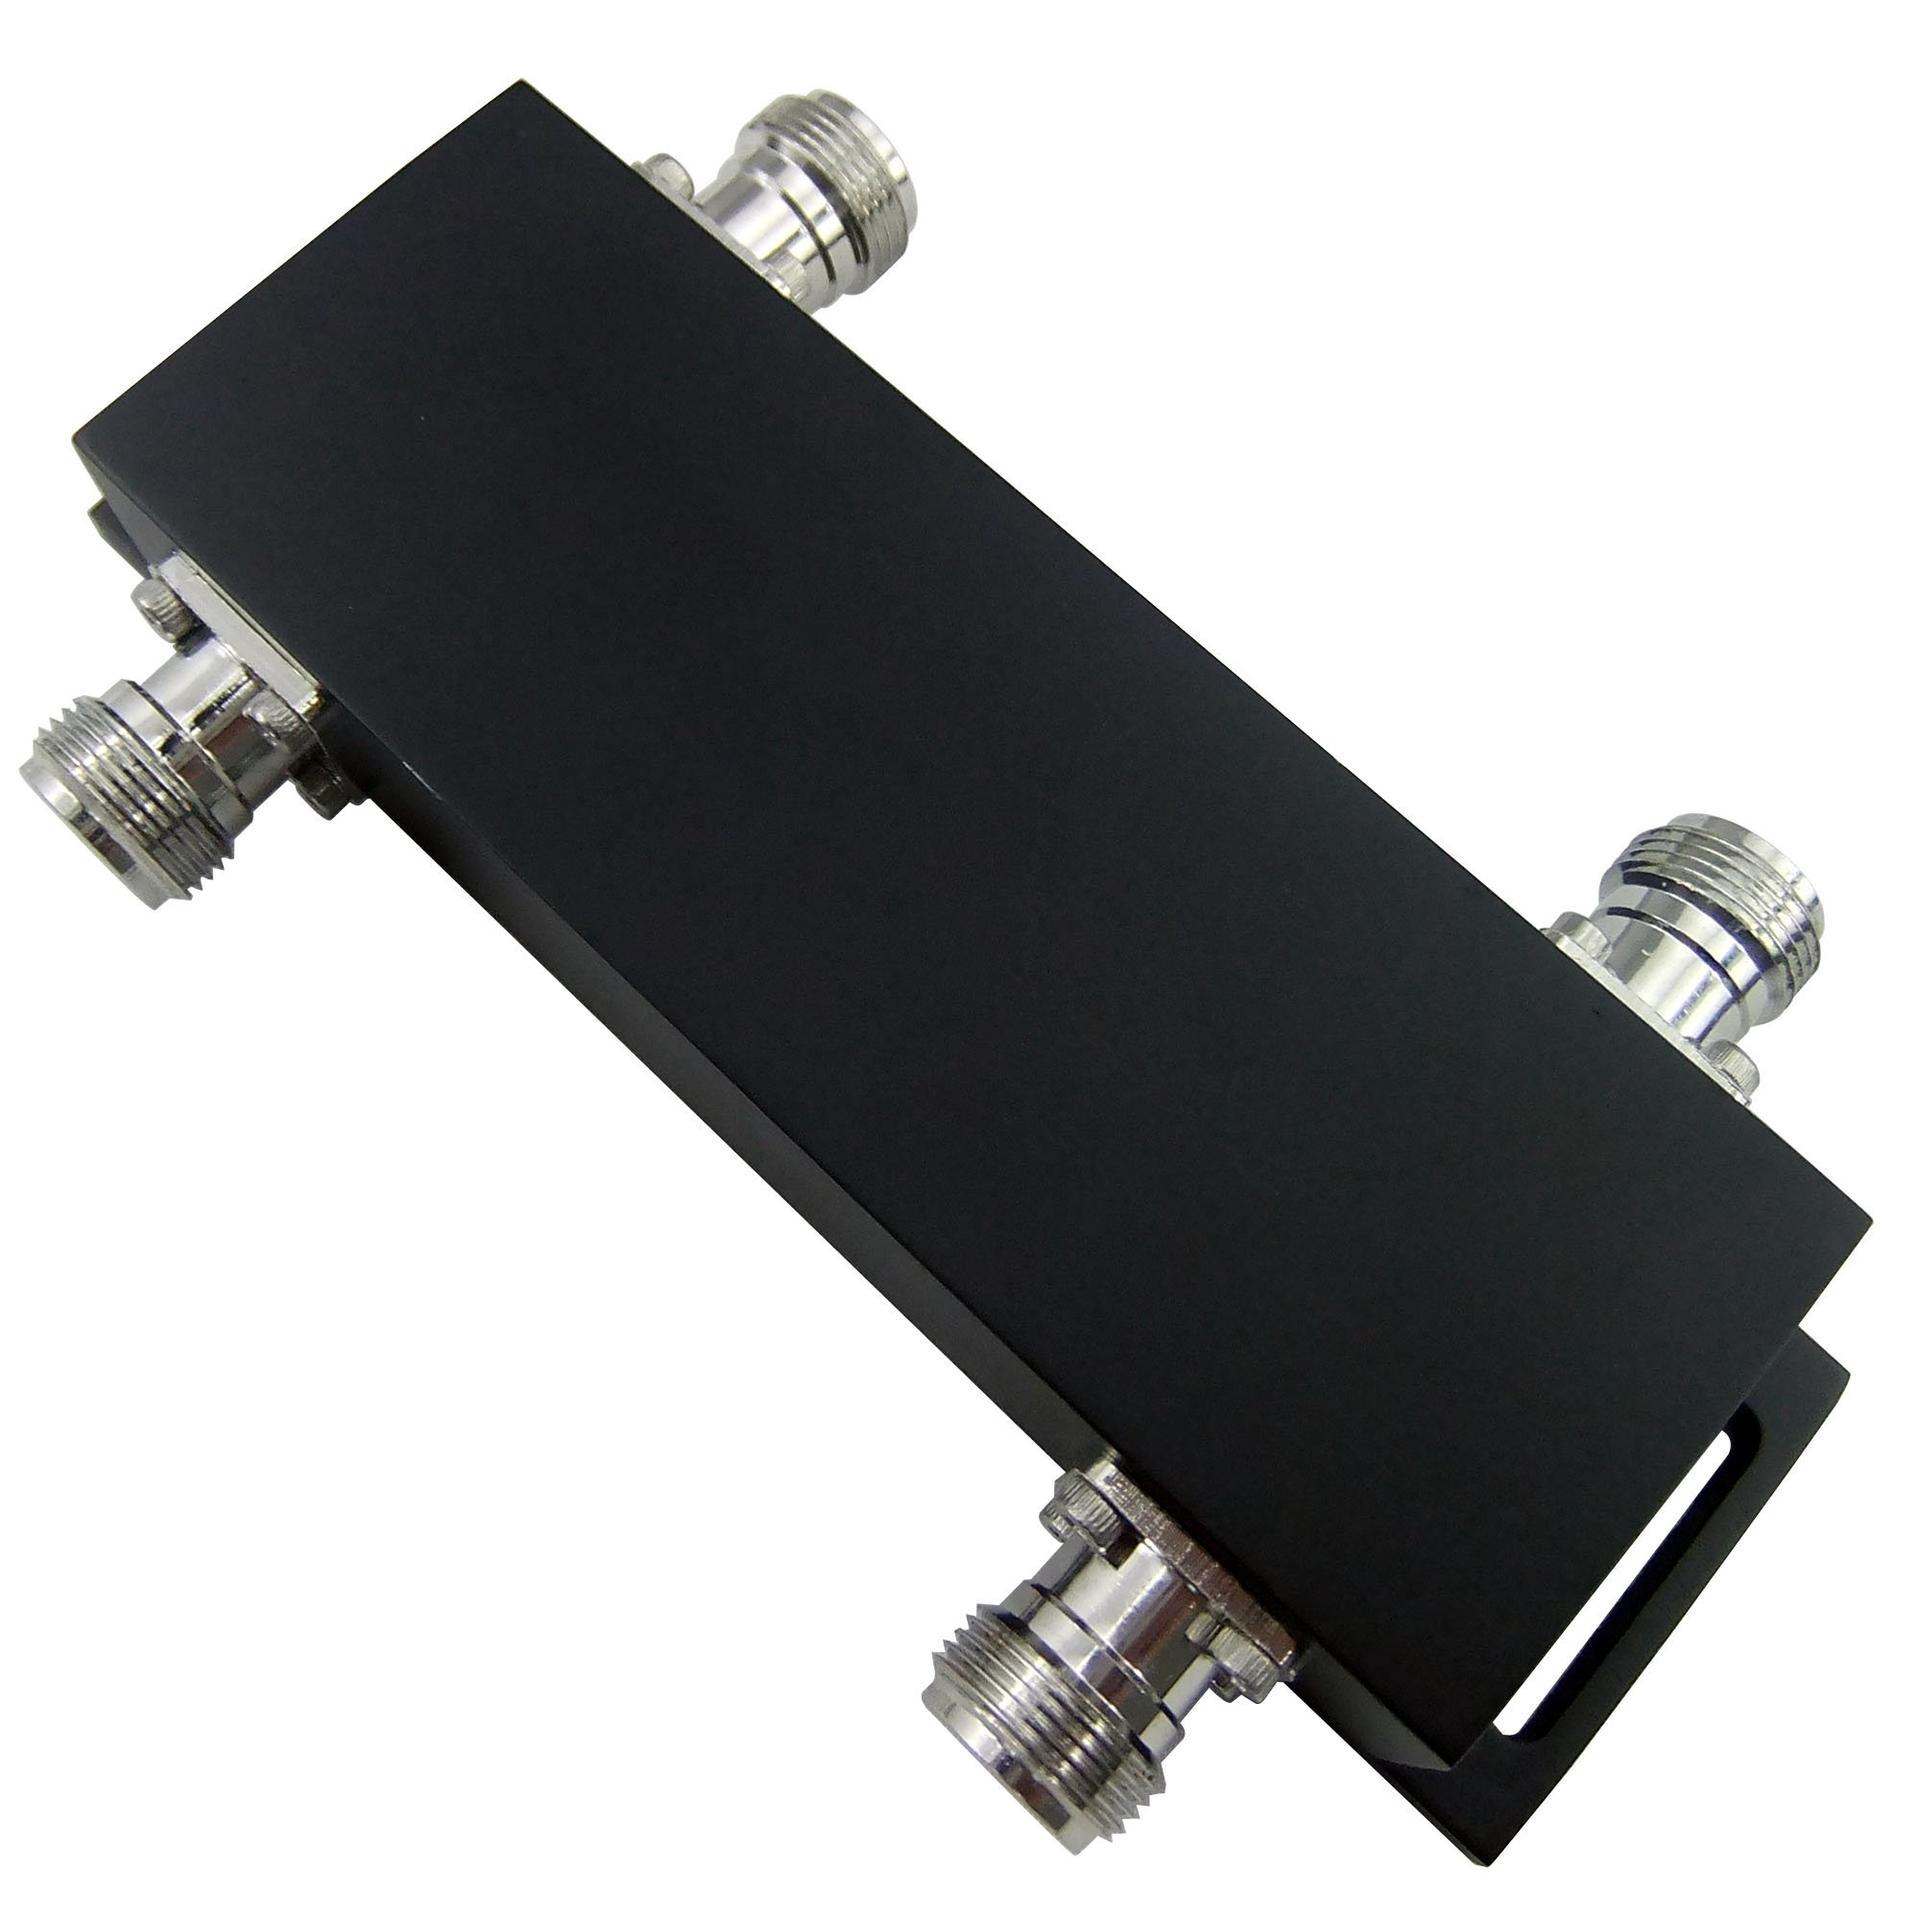 3dB Hybrid Coupler (800-2500MHz)